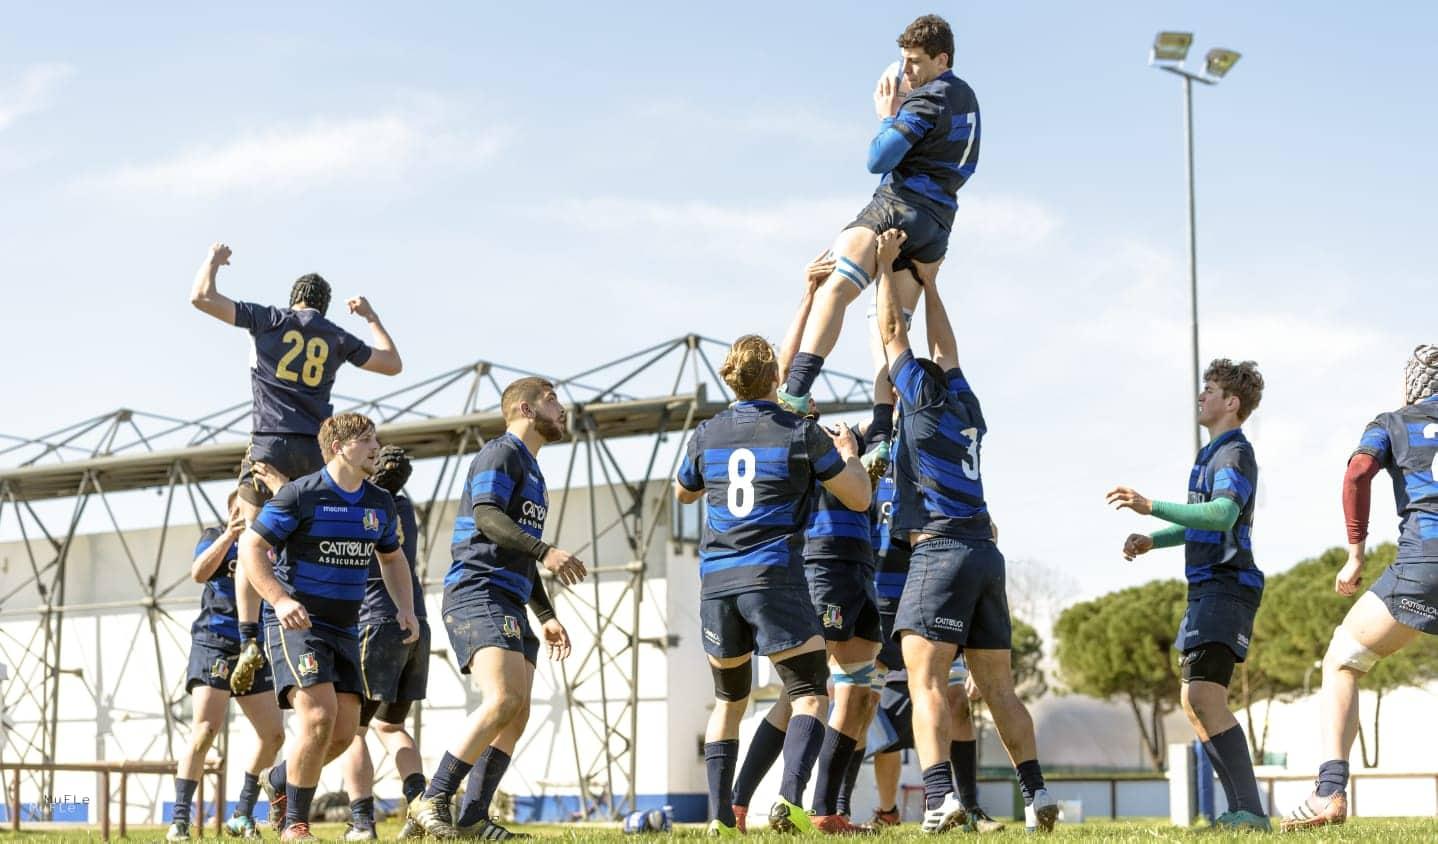 italia u18 allenamento mar19